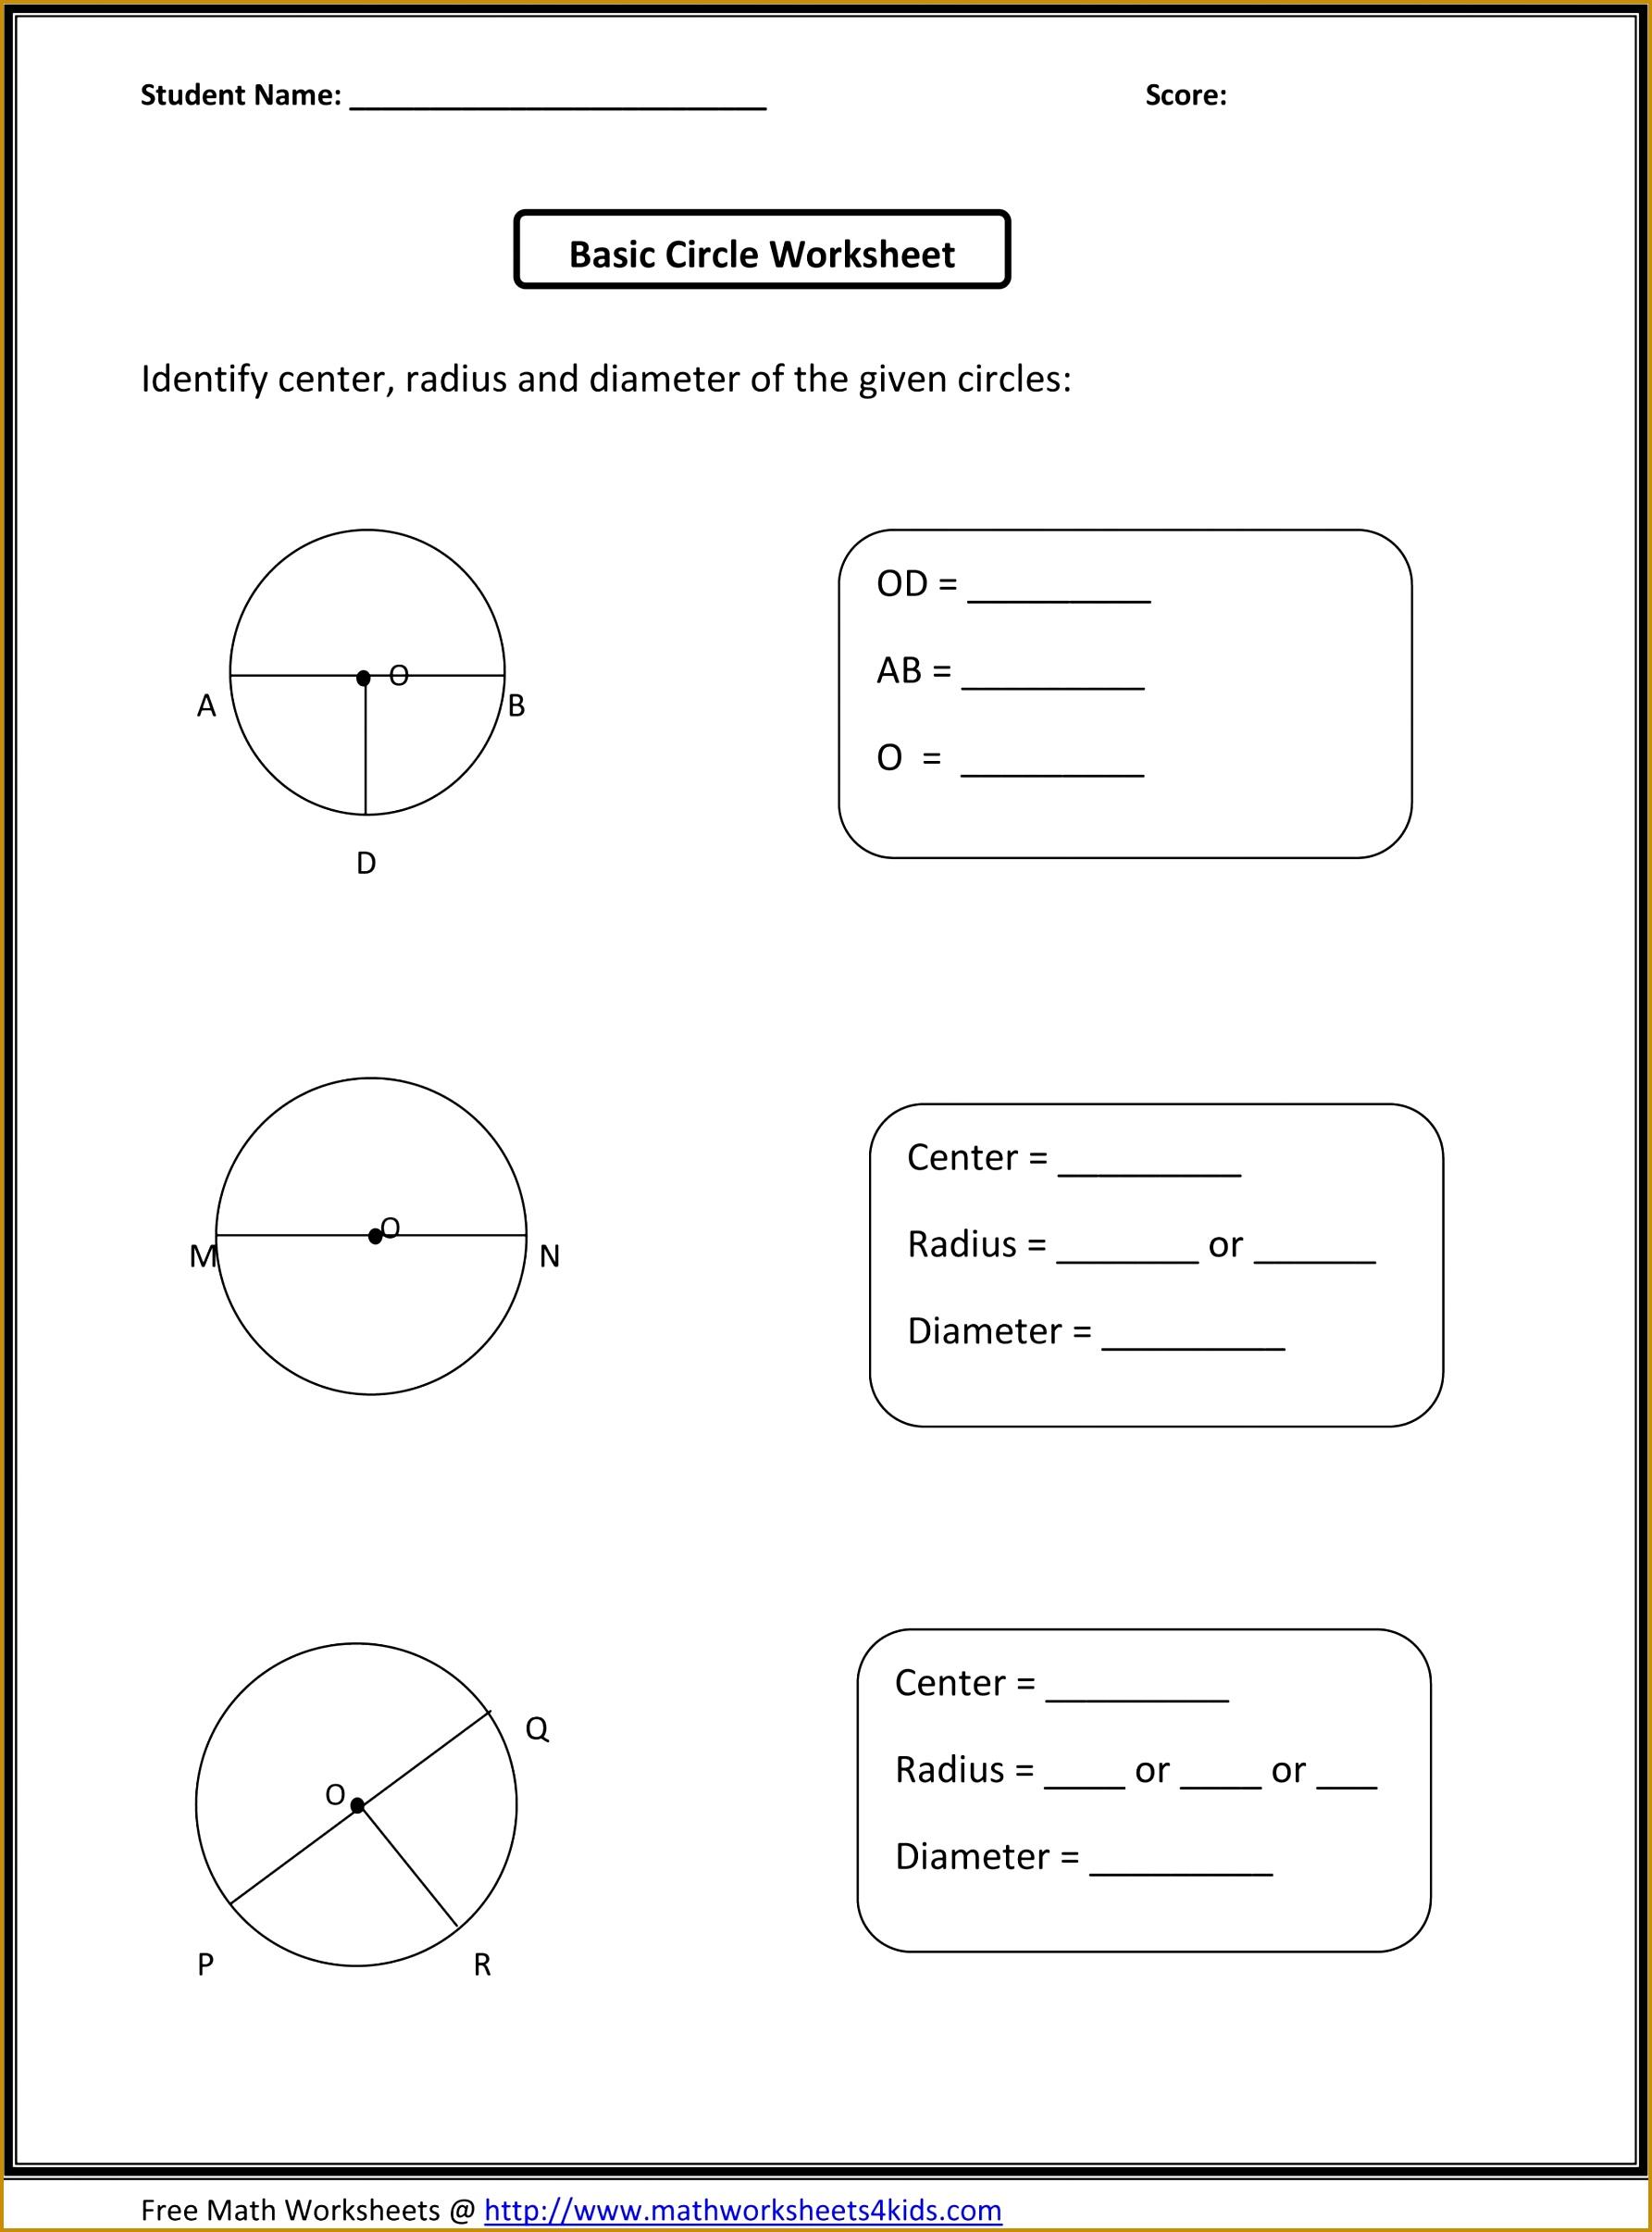 Third Grade Worksheets Beautiful Worksheets Multiplication 3rd Grade Math Practice for Third 24111785